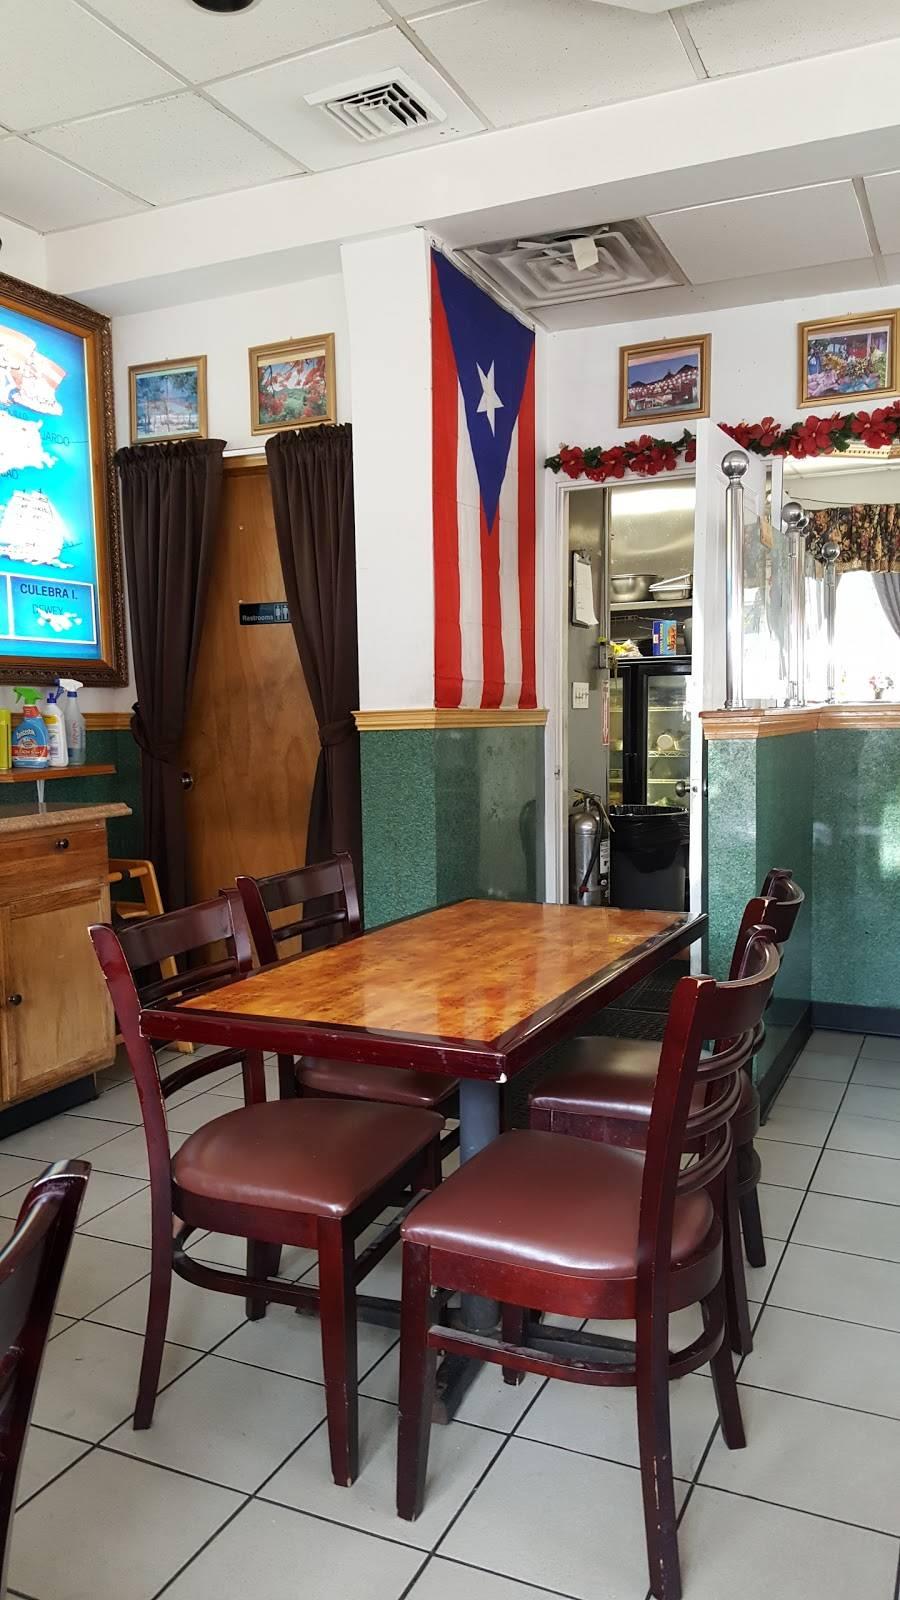 La Fonda Boricua | restaurant | 79 Wickham Ave, Middletown, NY 10940, USA | 8453425550 OR +1 845-342-5550